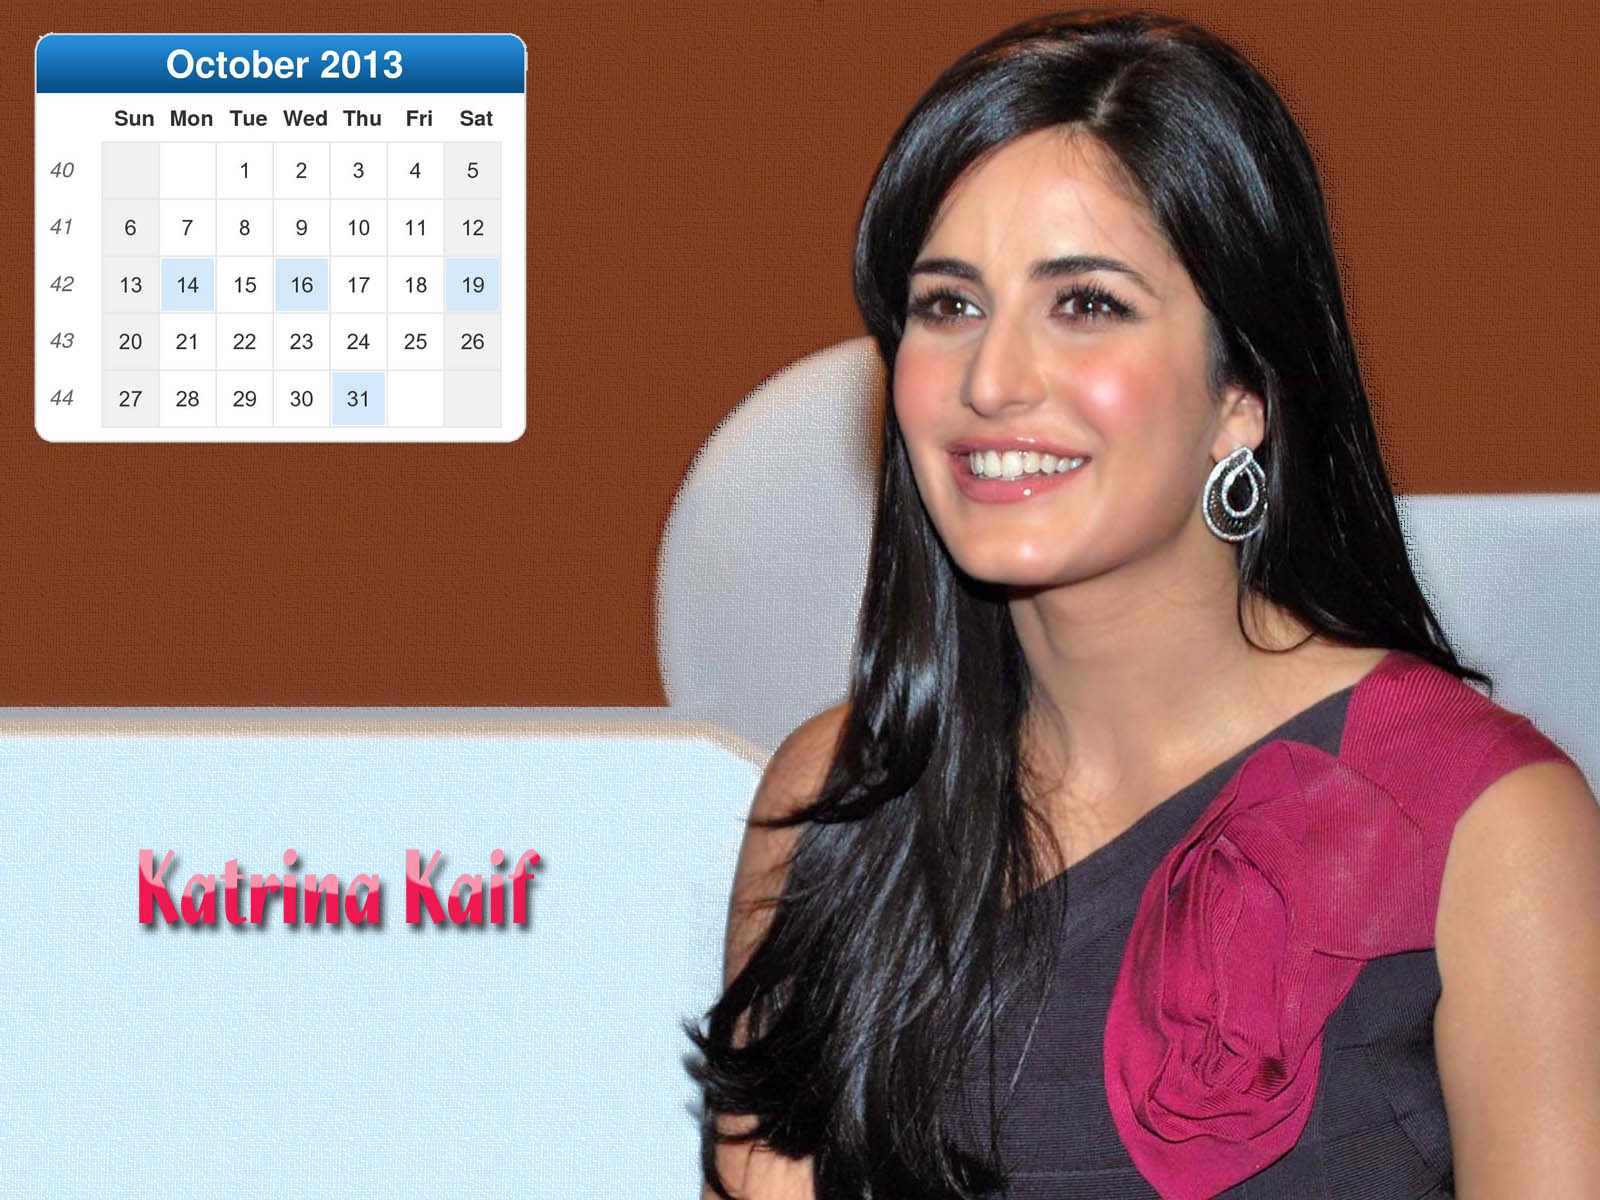 http://1.bp.blogspot.com/-F5nMeT0ZW_U/UMF3C8SdkPI/AAAAAAAAAB8/ANJQY8z8Tyo/s1600/katrina-kaif-desktop-calendar-october-2013.jpg